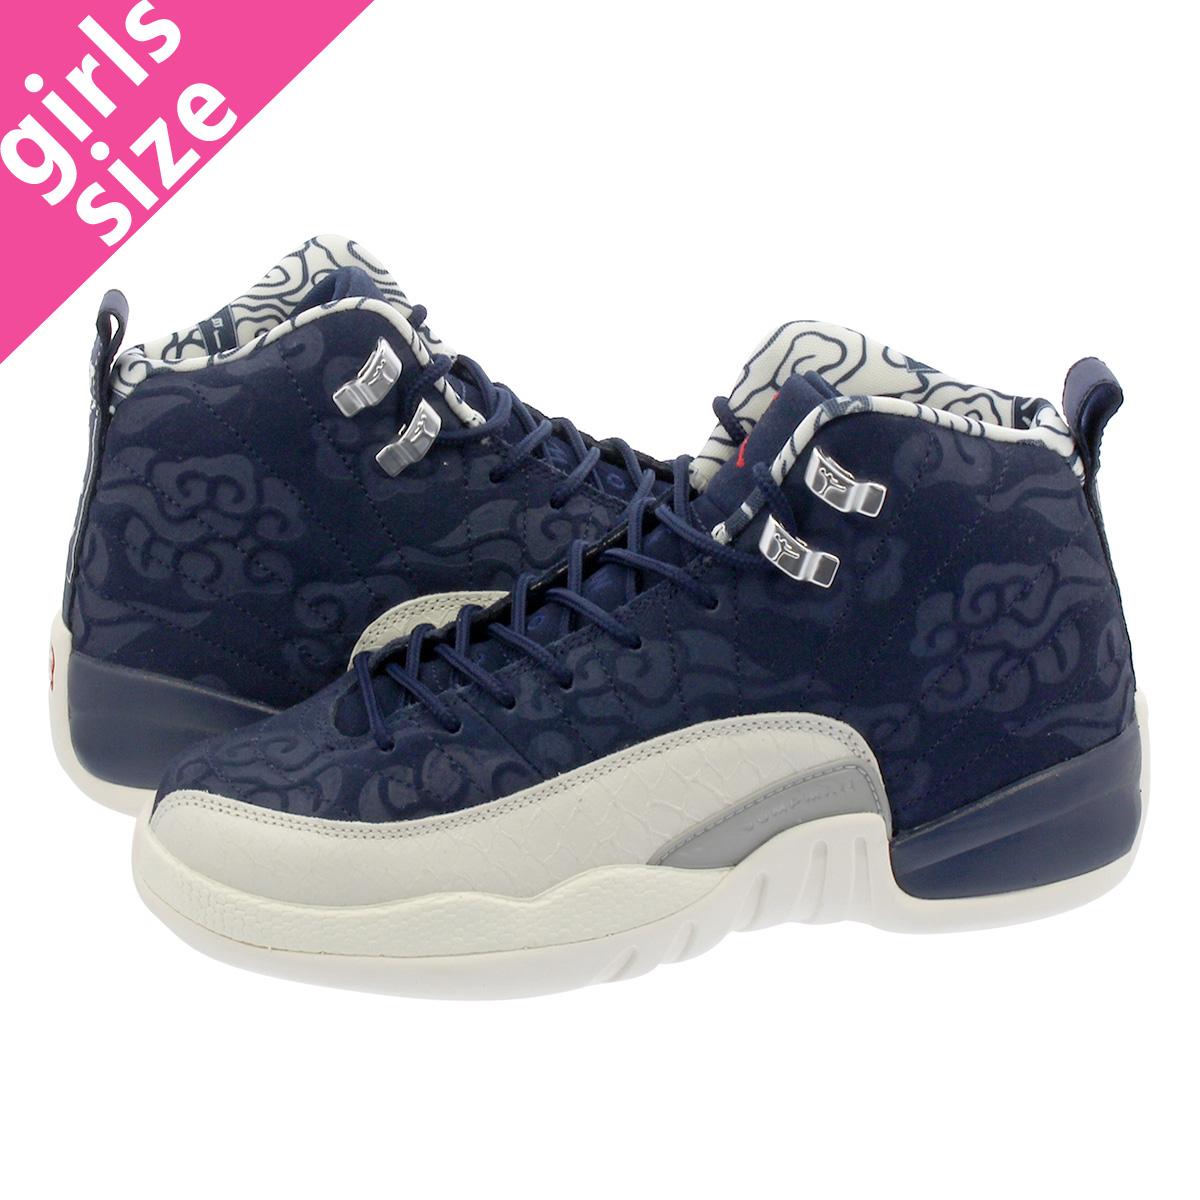 d997186399f9 NIKE AIR JORDAN 12 RETRO GS Nike Air Jordan 12 nostalgic GS COLLEGE  NAVY SAIL UNIVERSITY RED bv8017-445